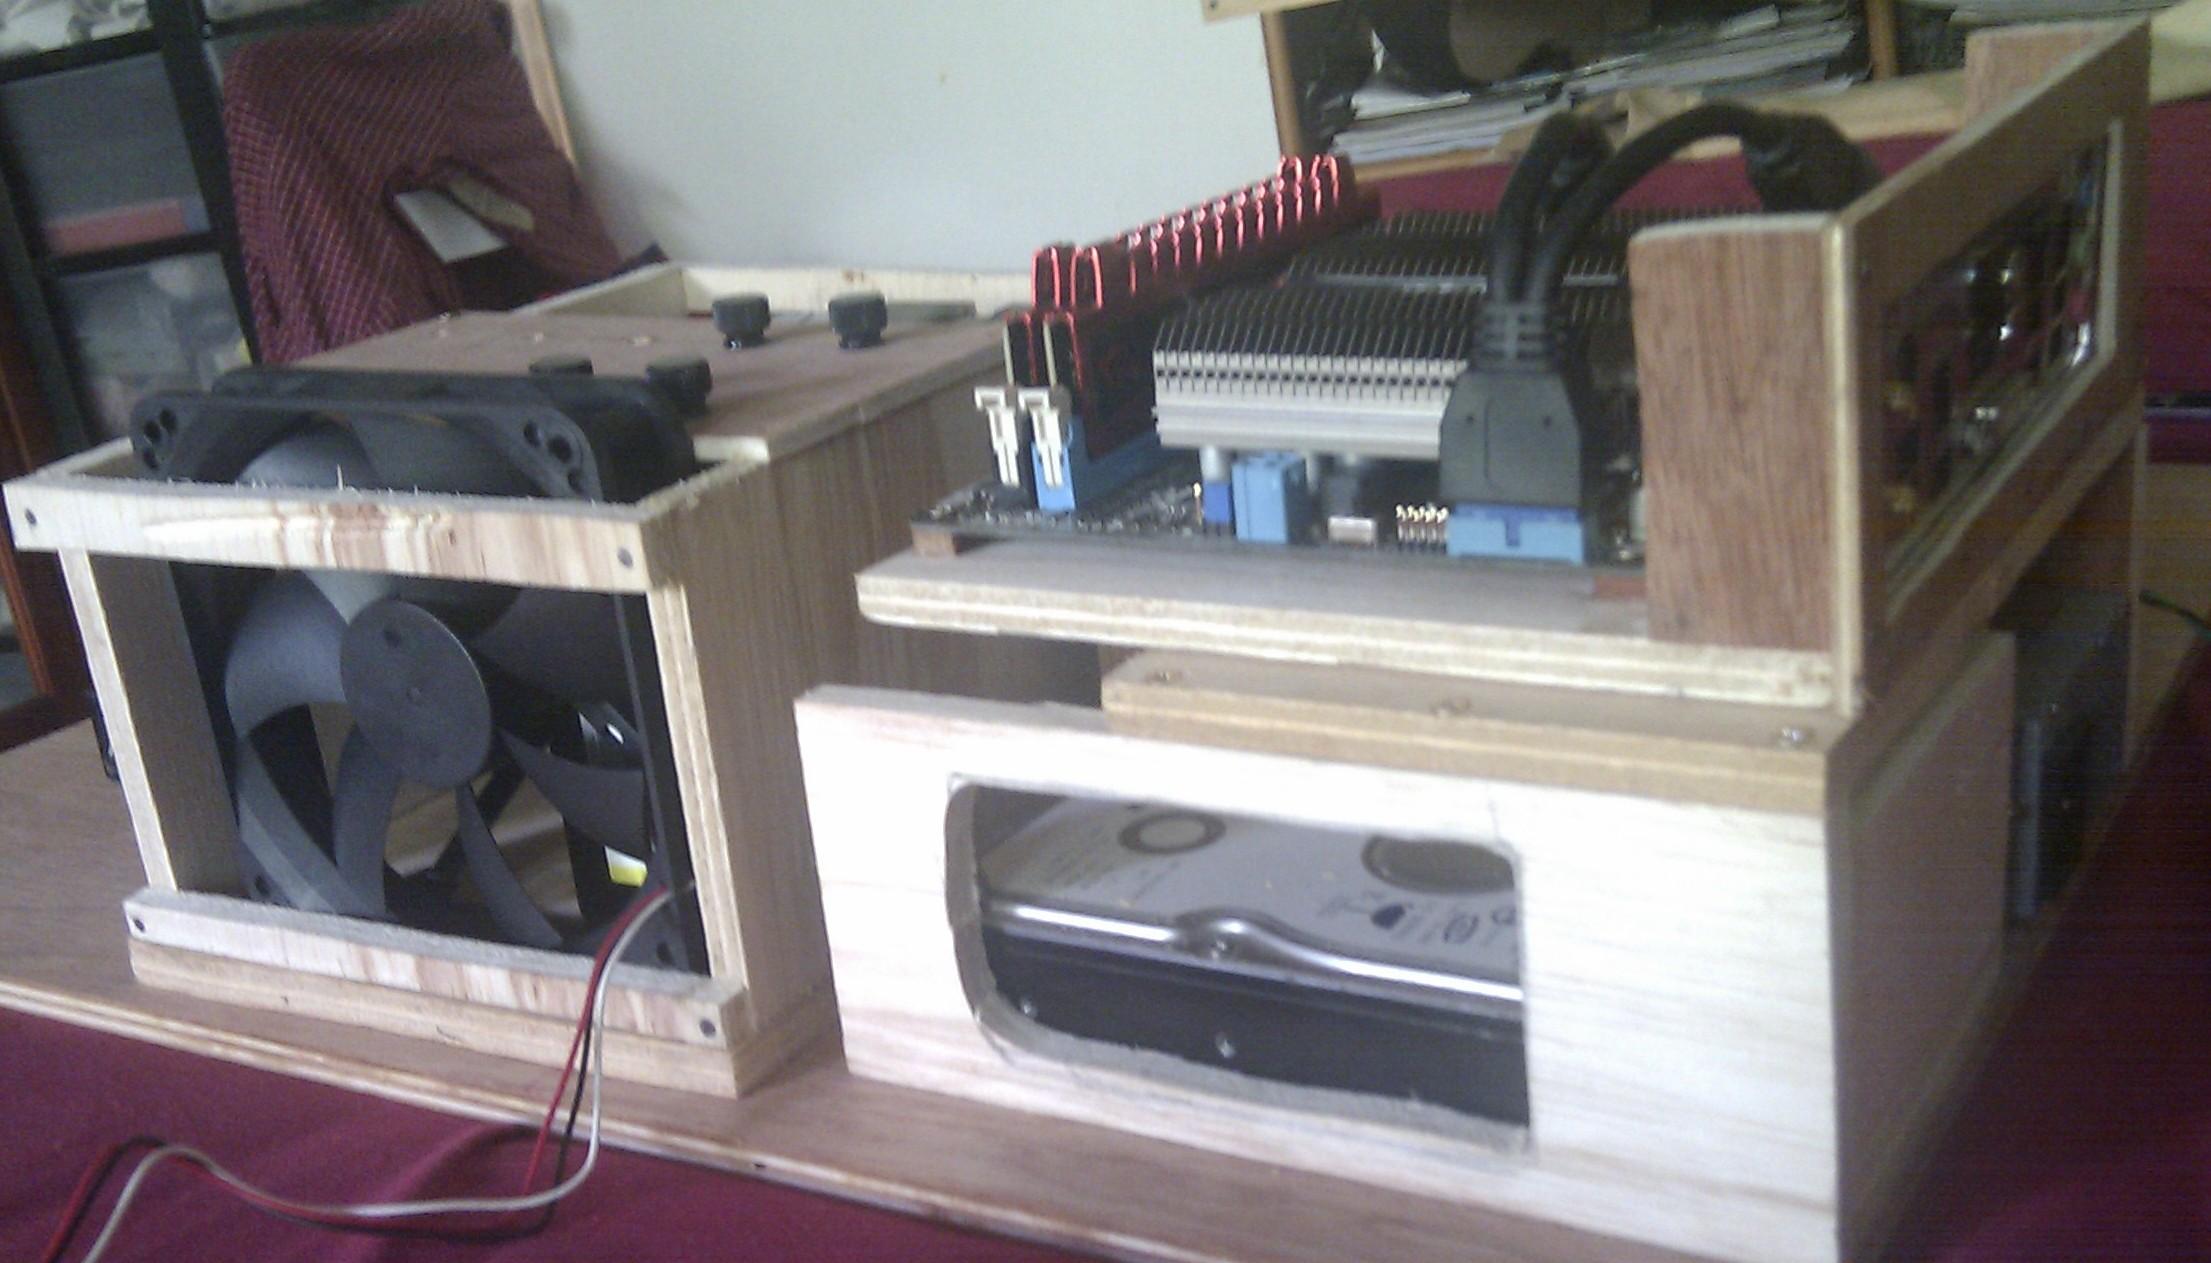 Fabrication dun boitier NAS en bois MK1  Personnalisation de PC  ~ Boitier Pc En Bois